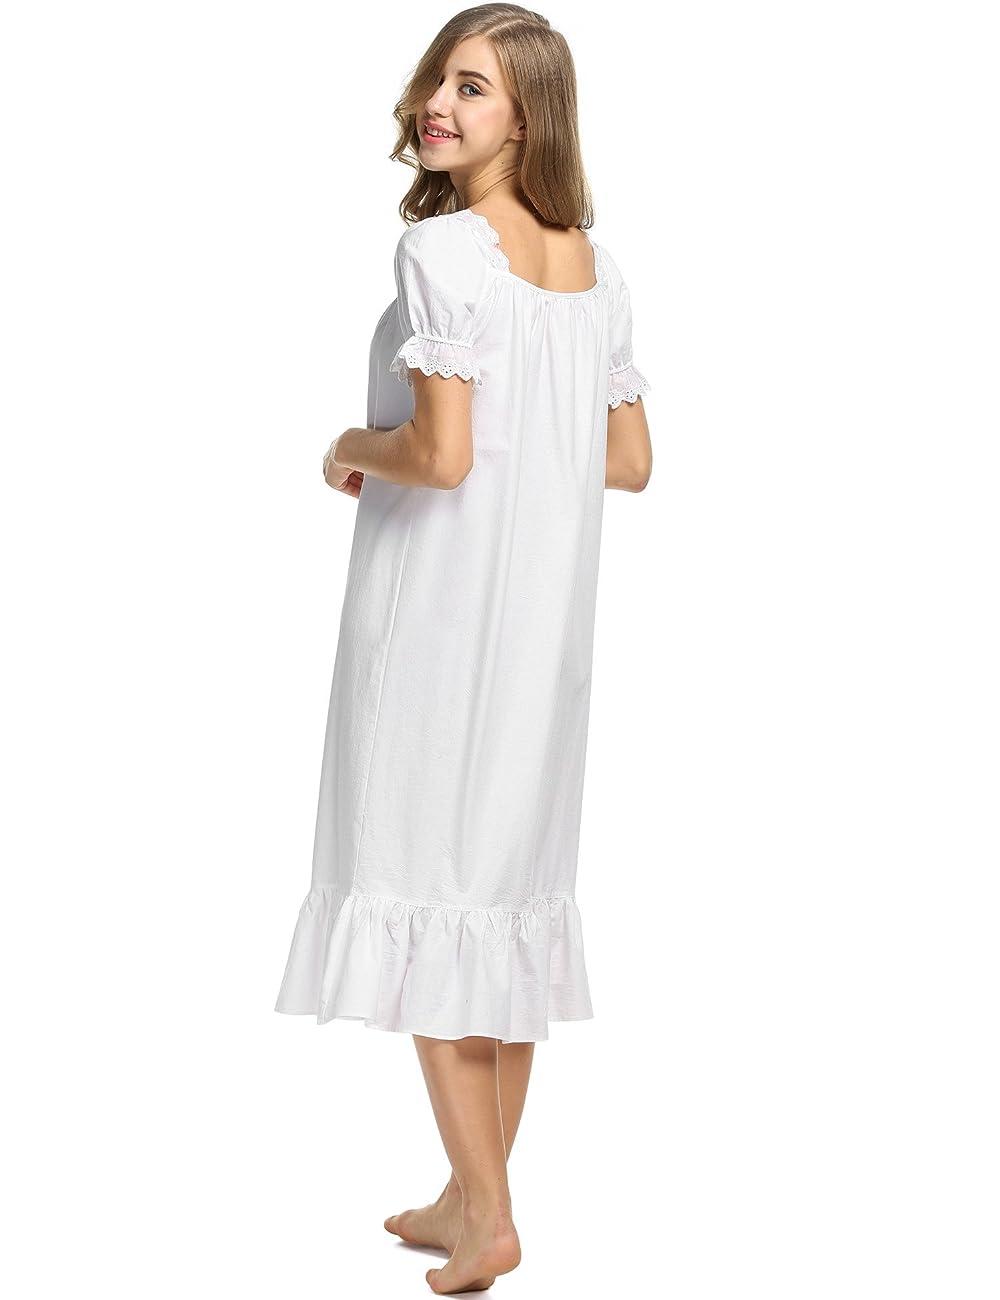 Avidlove Womens Cotton Victorian Vintage Short Sleeve Nightgown Sleepwear 4